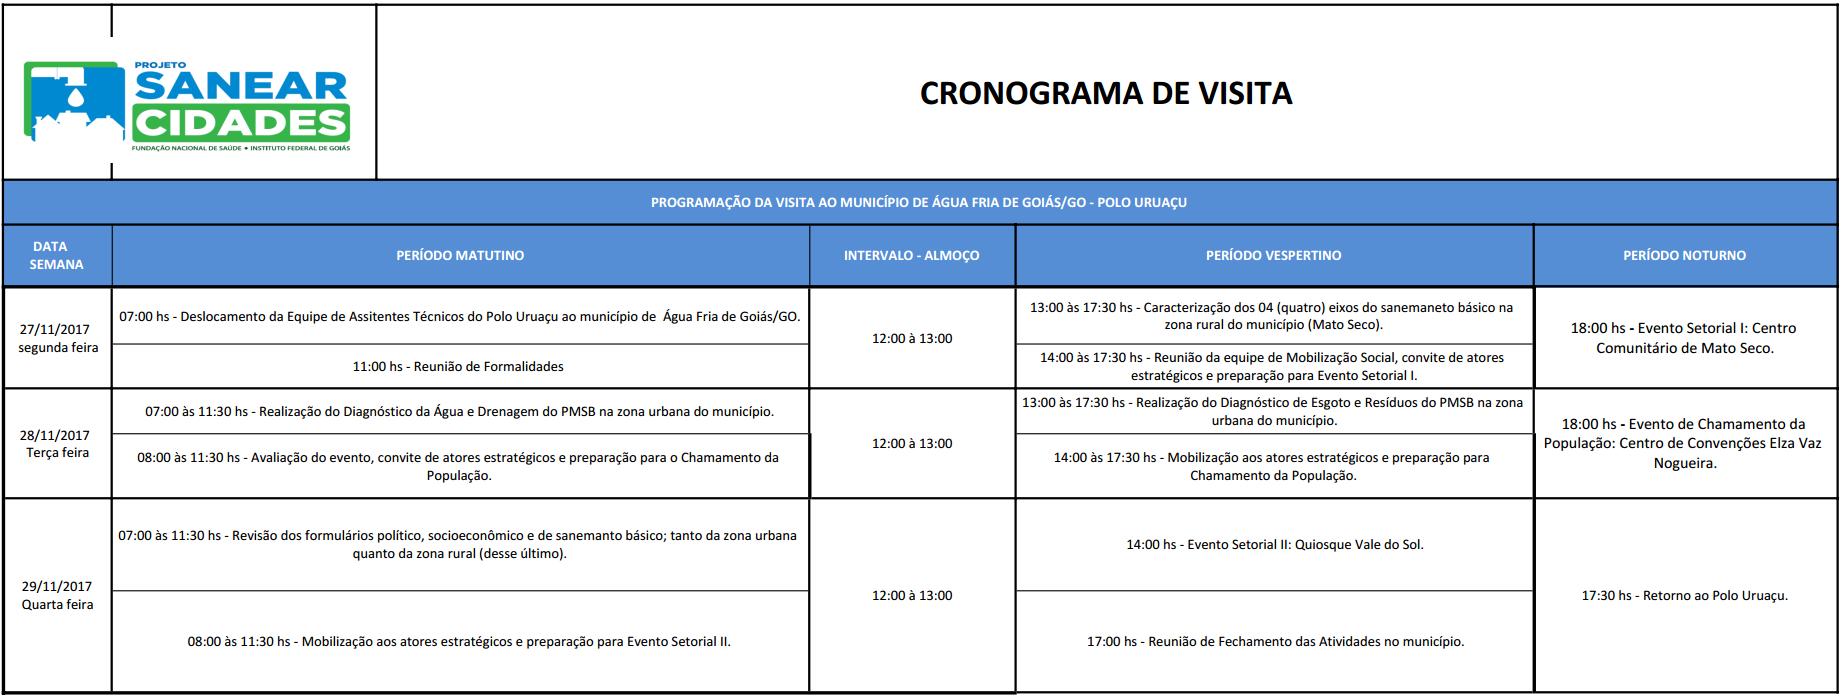 Cronograma-de-Visita-Agua-Fria-de-Goias